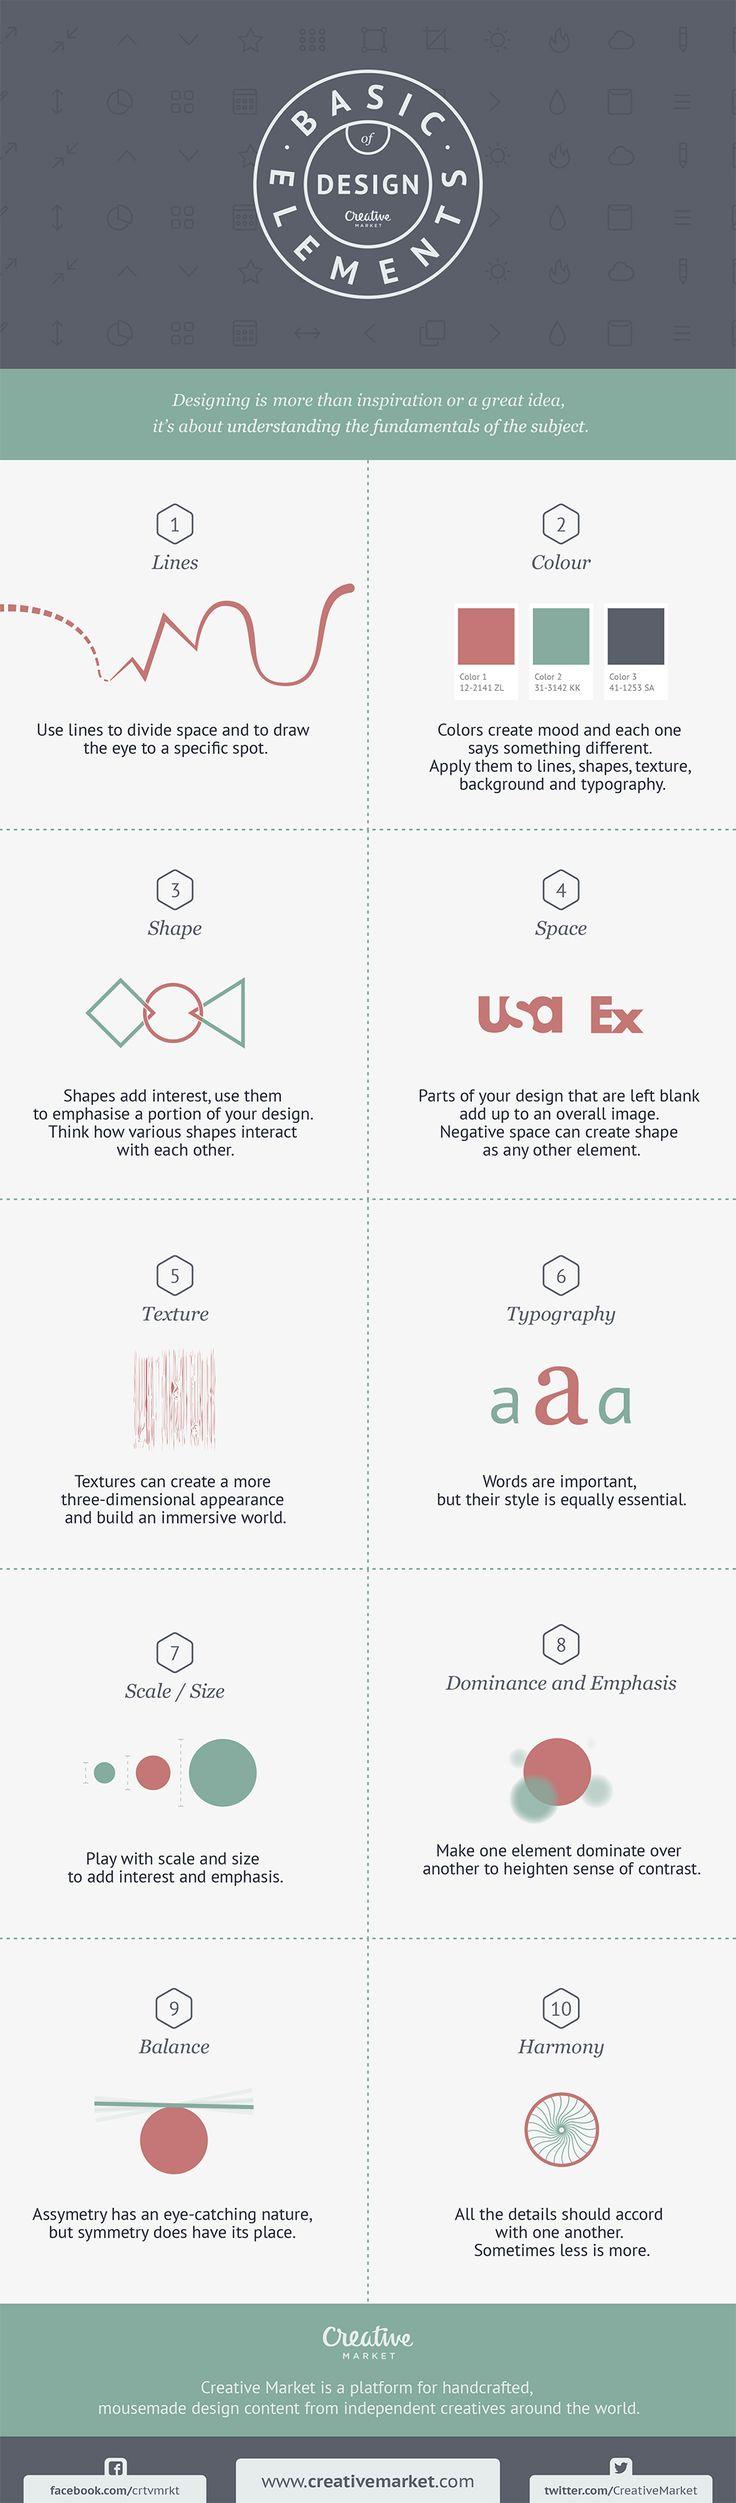 10 Basic Elements of Design You & Your Website Designer Should Stick To [Infographic]